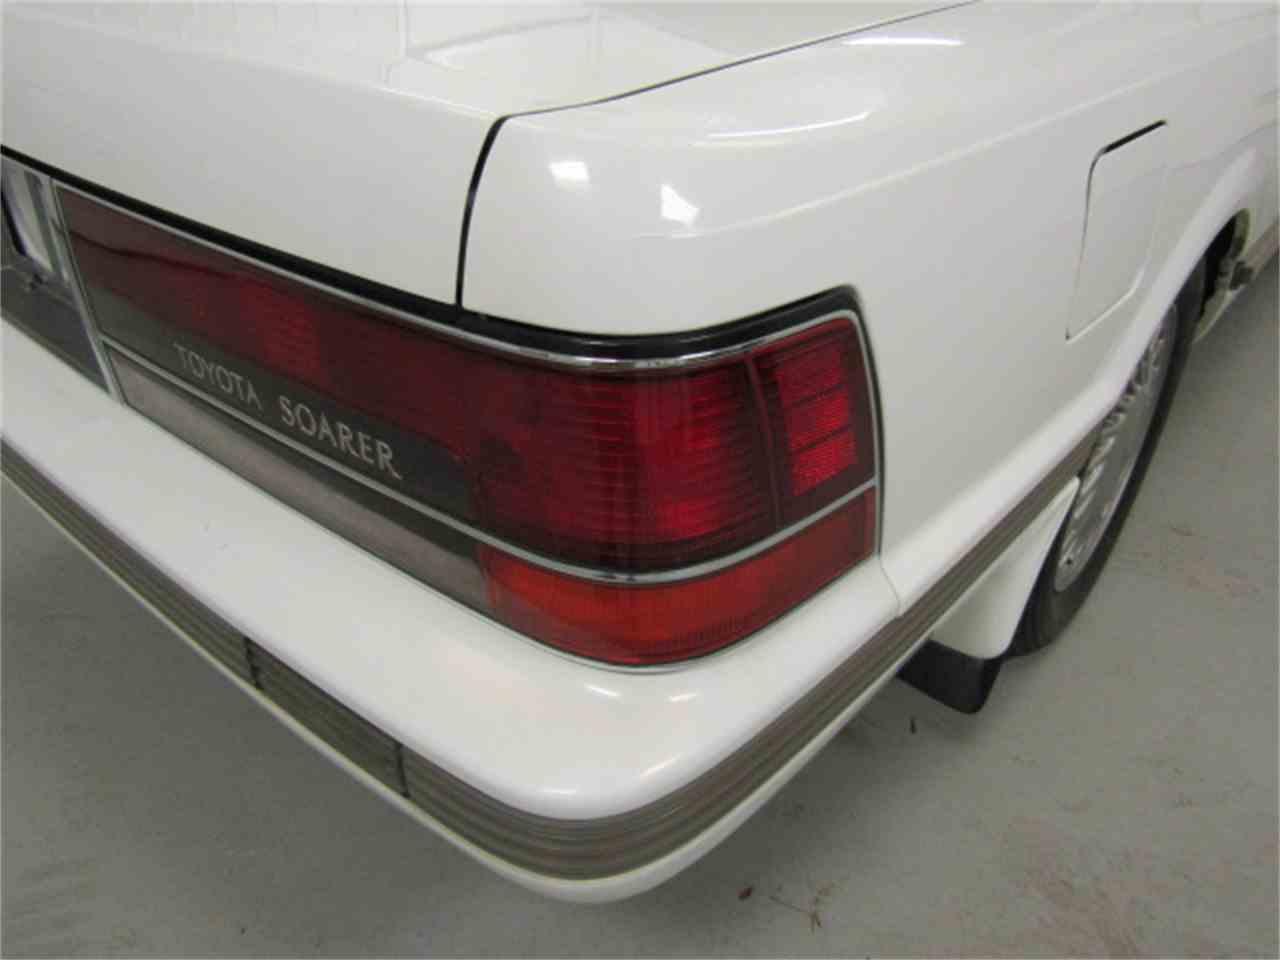 Large Picture of '87 Toyota Soarer - $7,999.00 - JLB2